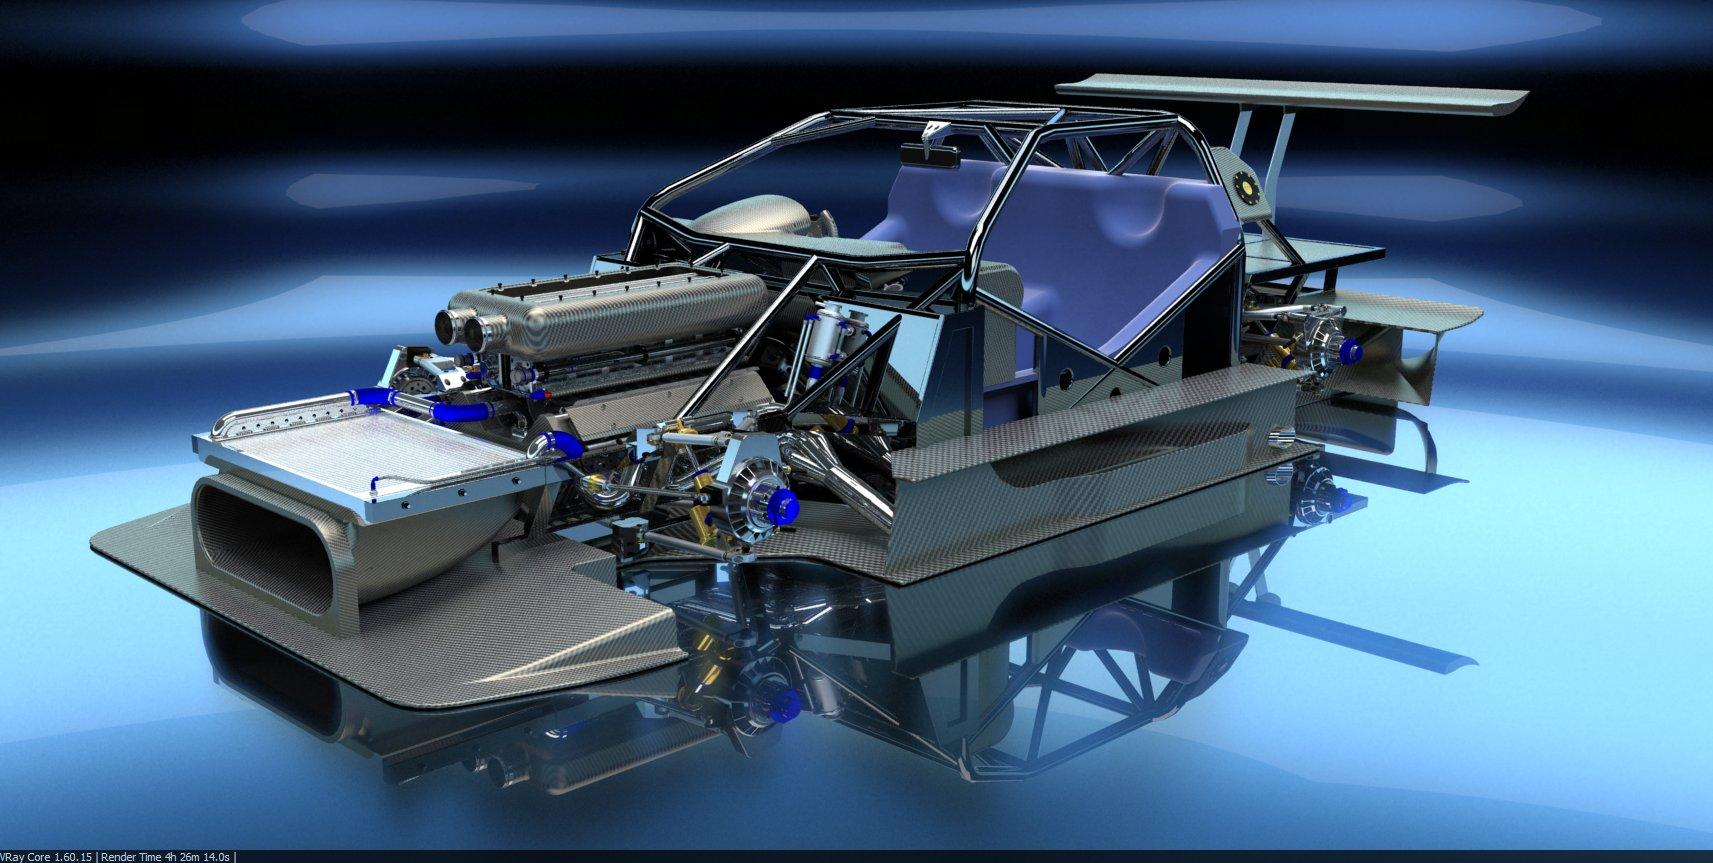 PEASNELL RACING DESIGN 575 GTC HILLCLIMB CAR DETAIL (4)